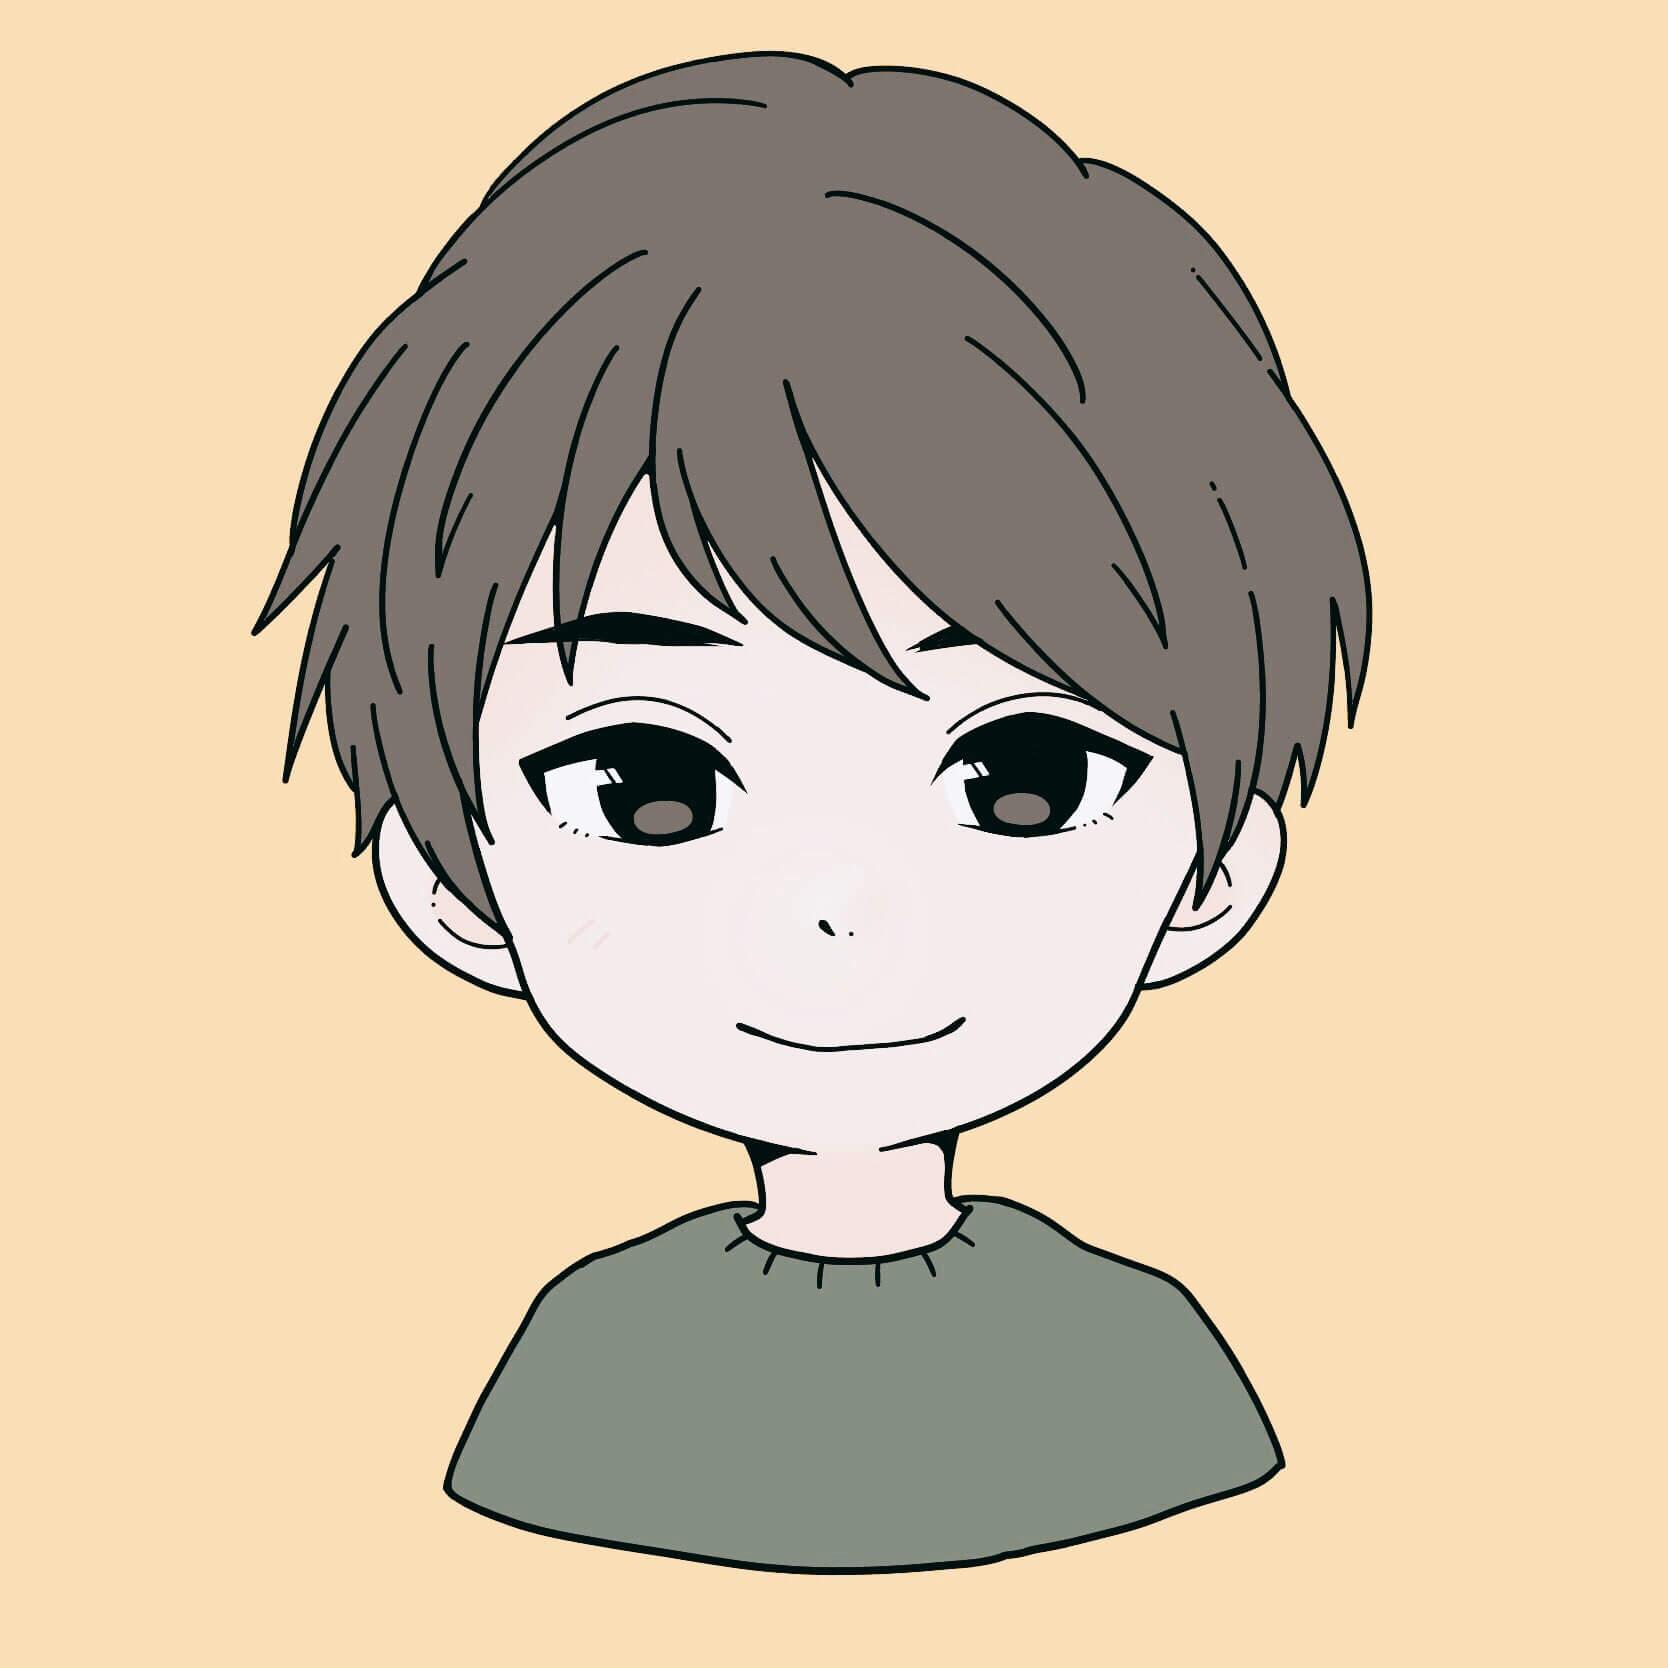 https://www.kumao-blog.com/wp-content/uploads/2019/11/a3b2516c256dbb342ea9c6d58984fd7b.jpg